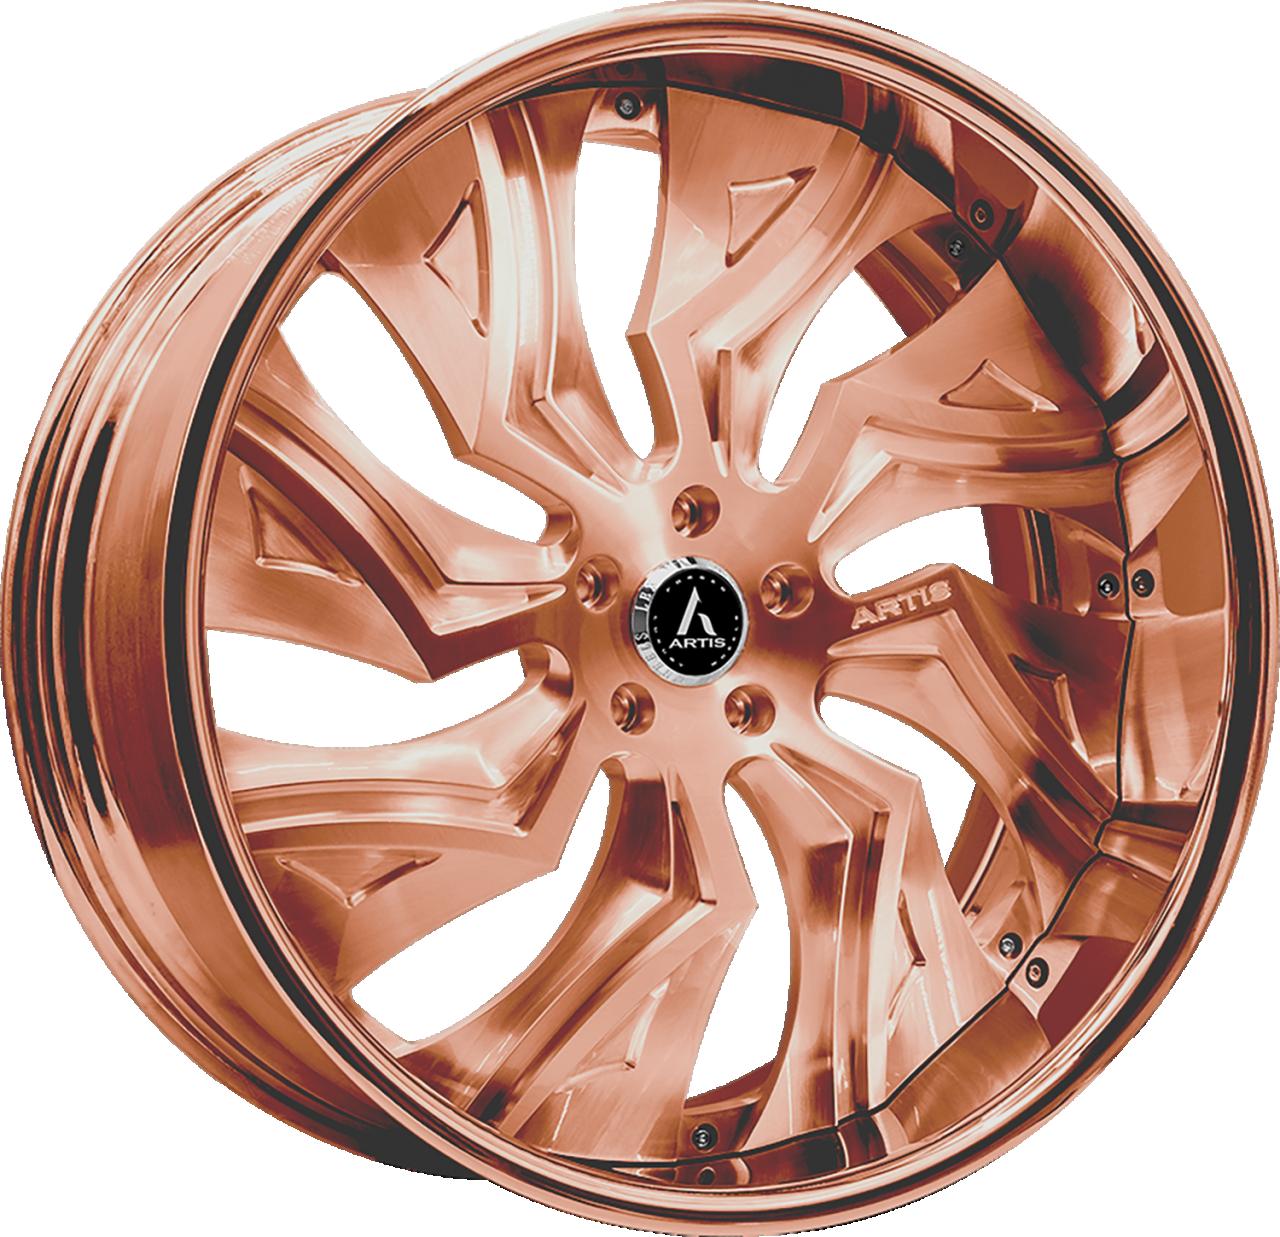 Artis Forged Buckeye wheel with Custom Rose Gold finish